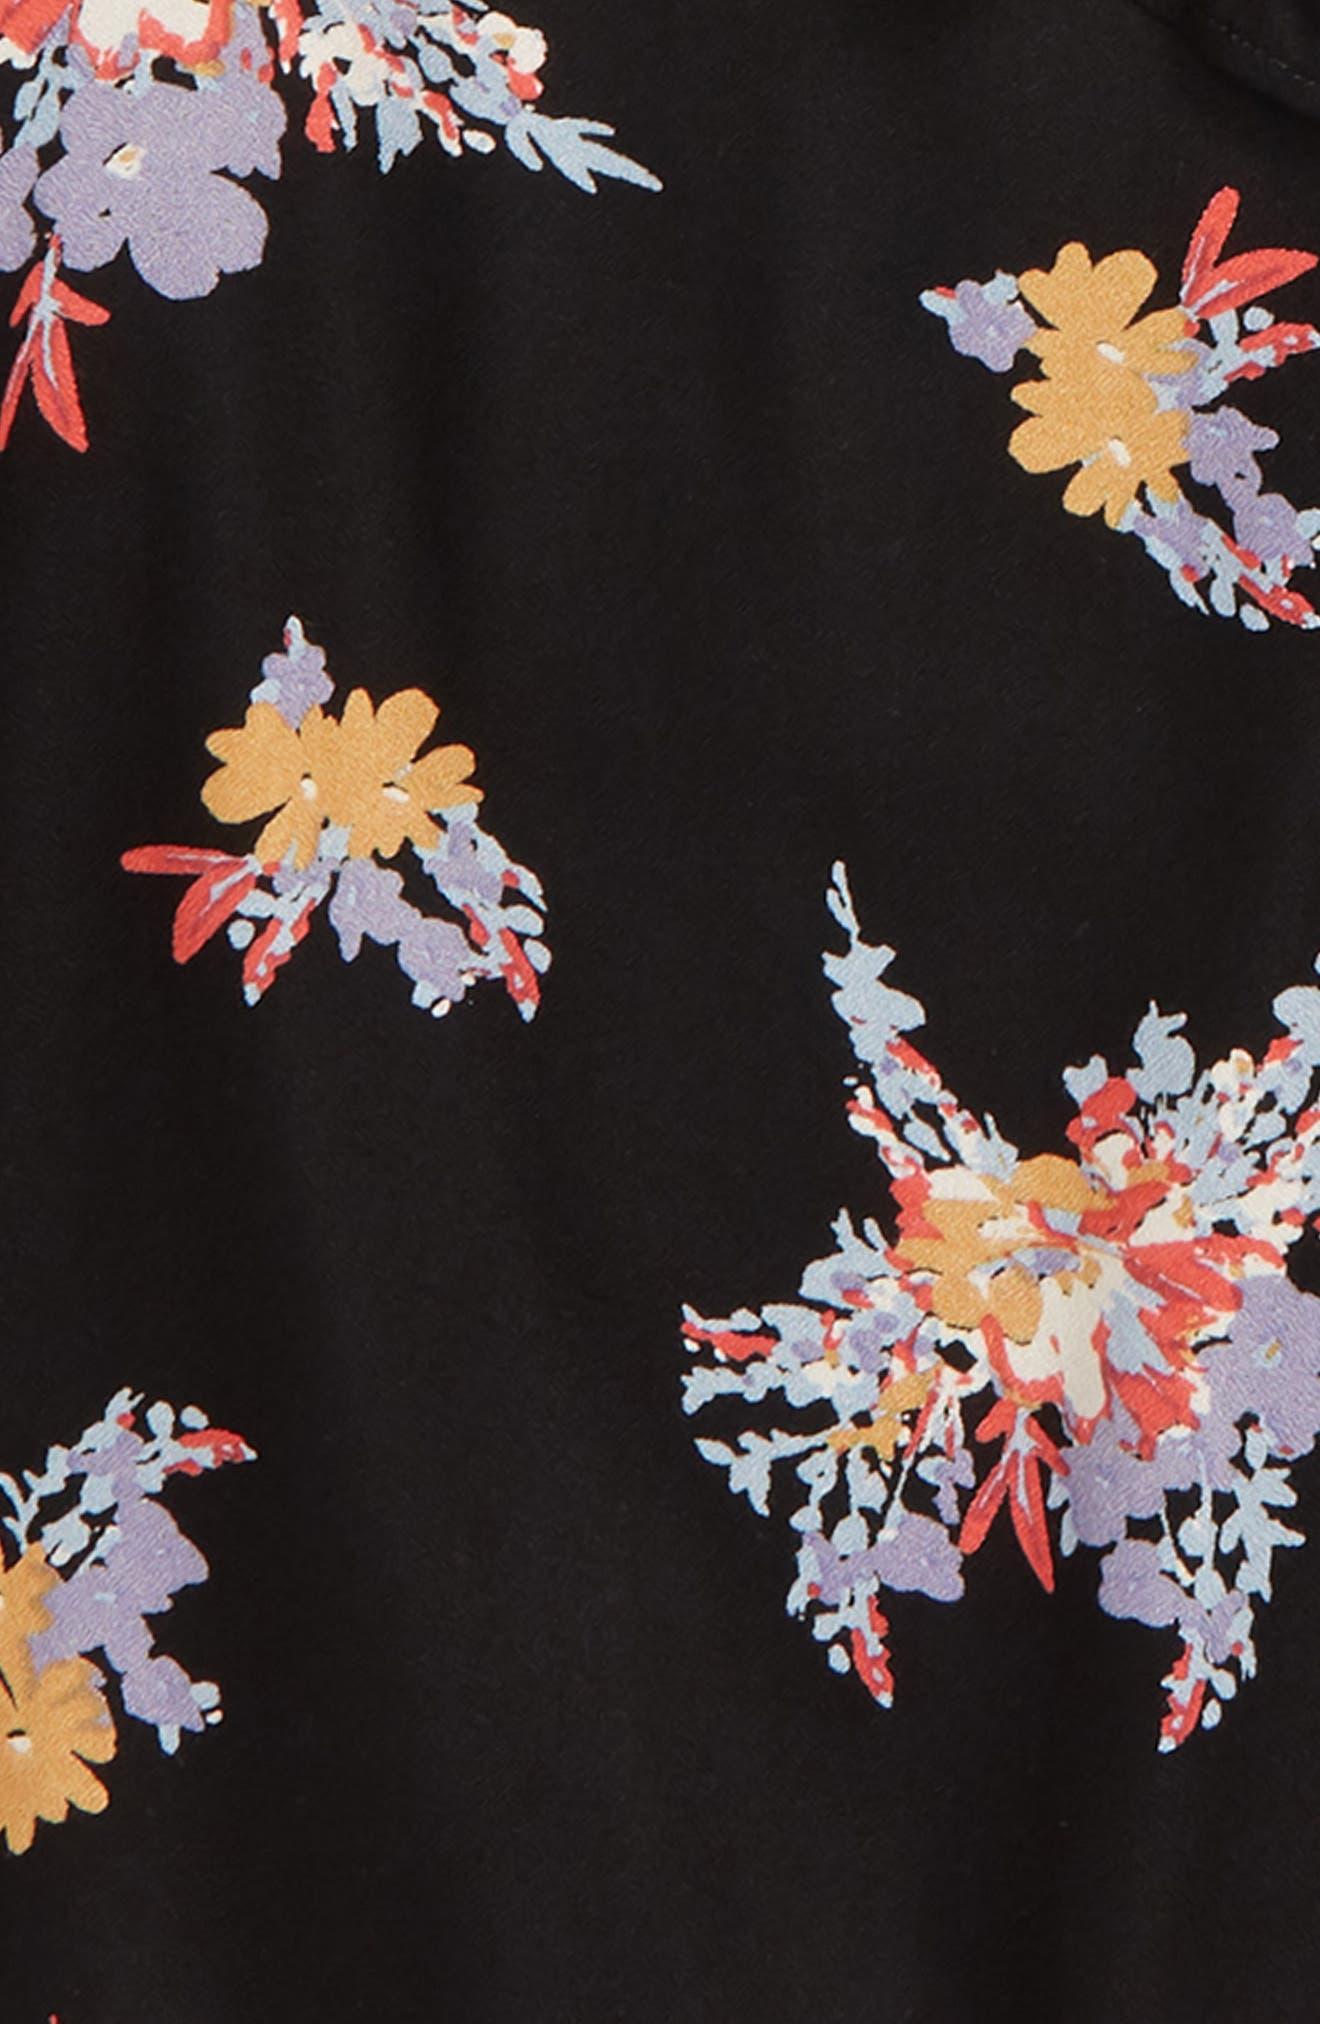 Floral Print Ruffle Top,                             Alternate thumbnail 2, color,                             BLACK CLUSTER FLORAL